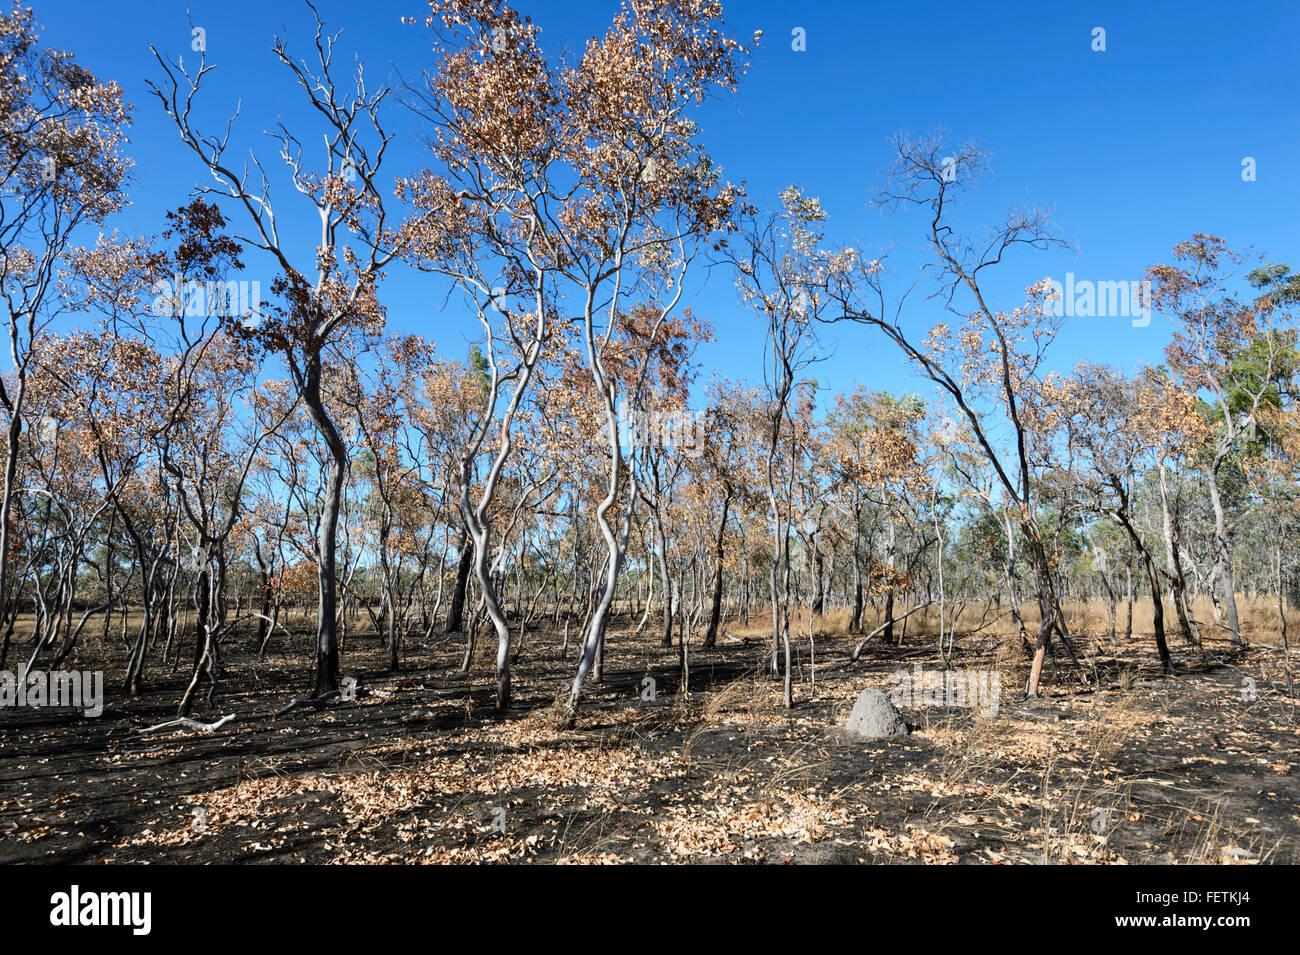 Bushfire damage, Gulf Savannah, Queensland, QLD, Australia - Stock Image